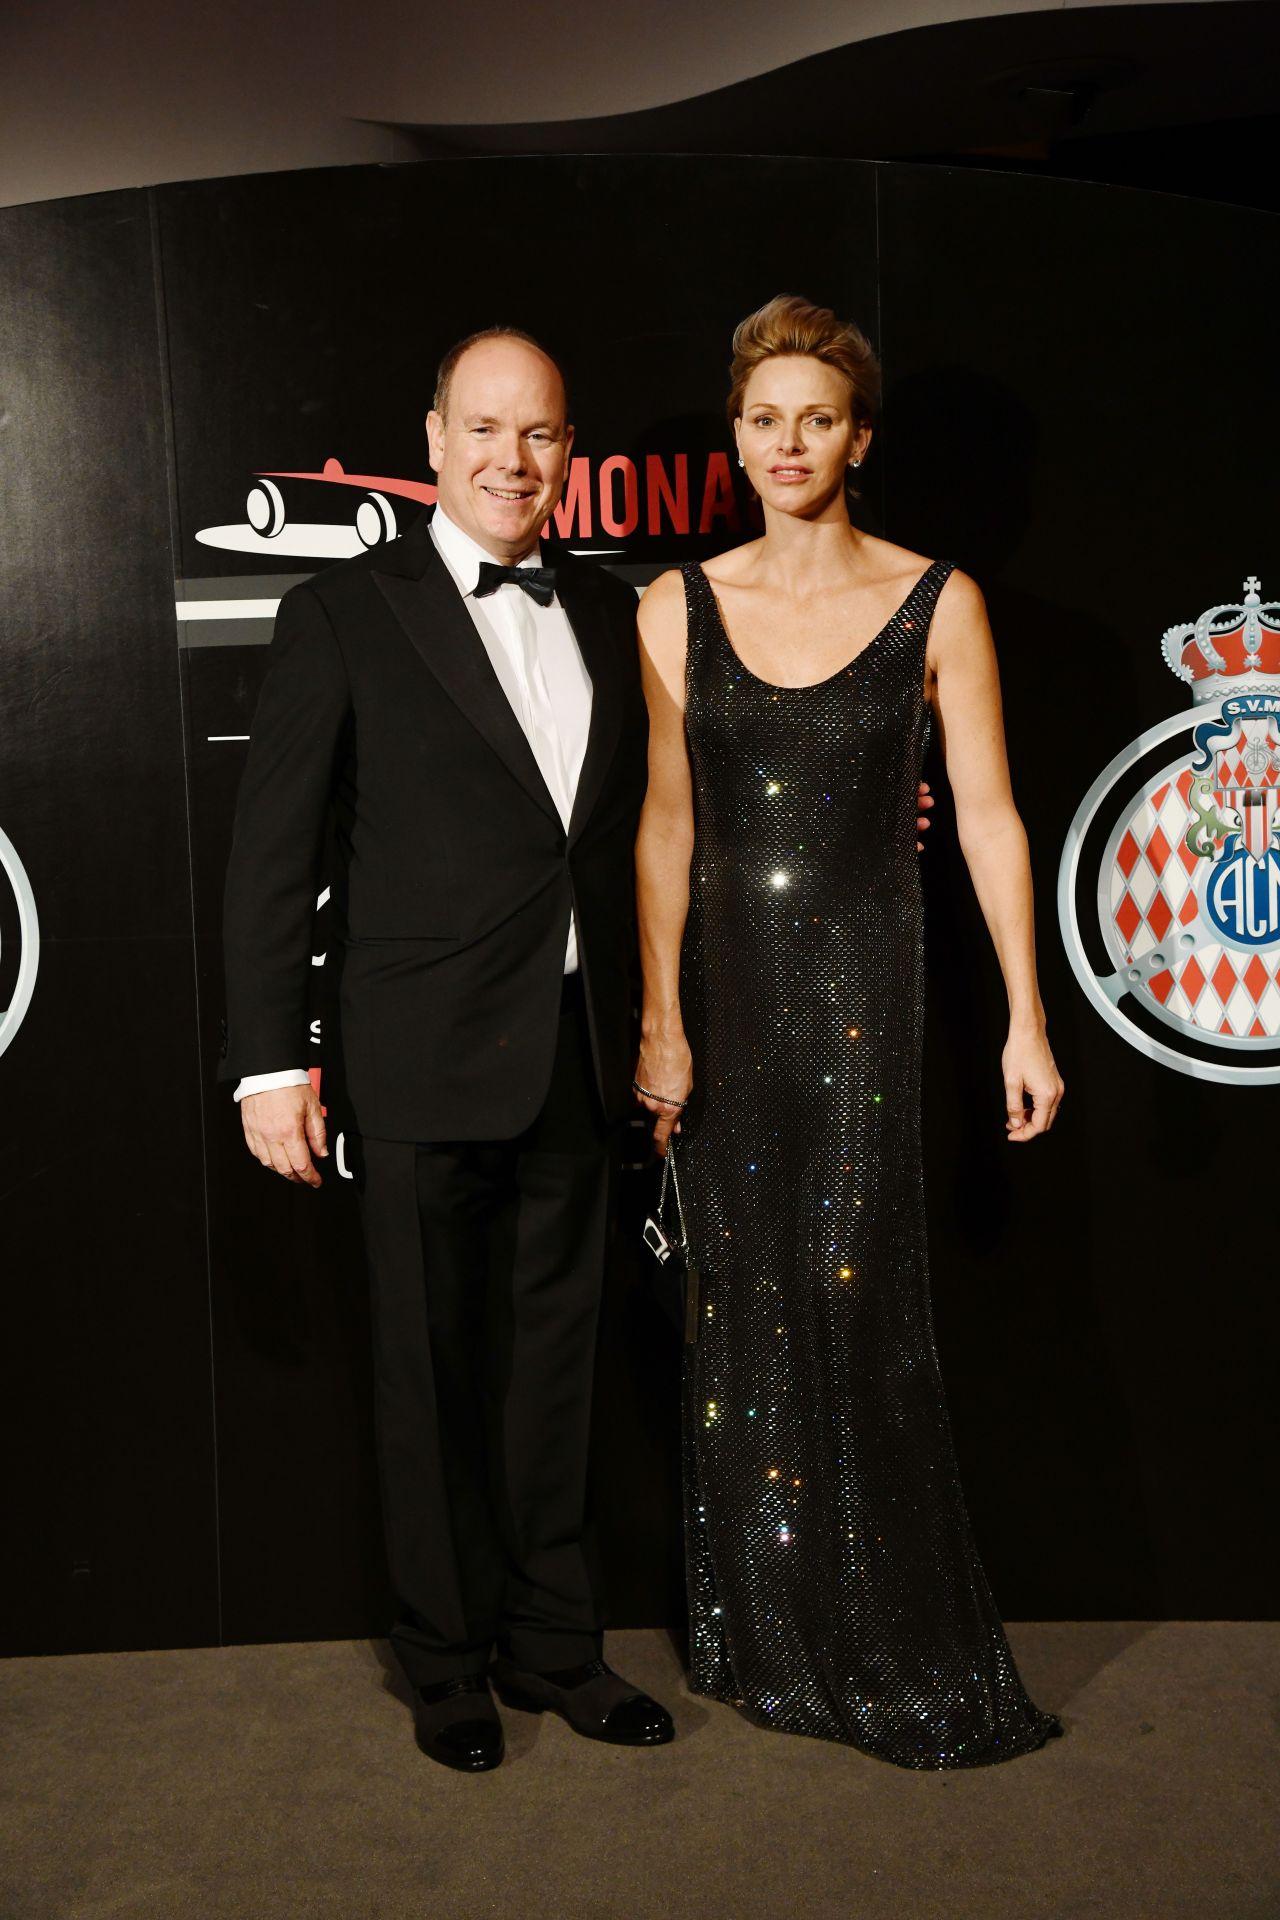 Princess Charlene Of Monaco Acm Dinner Gala F1 Grand Prix Of Monaco 05 27 2018